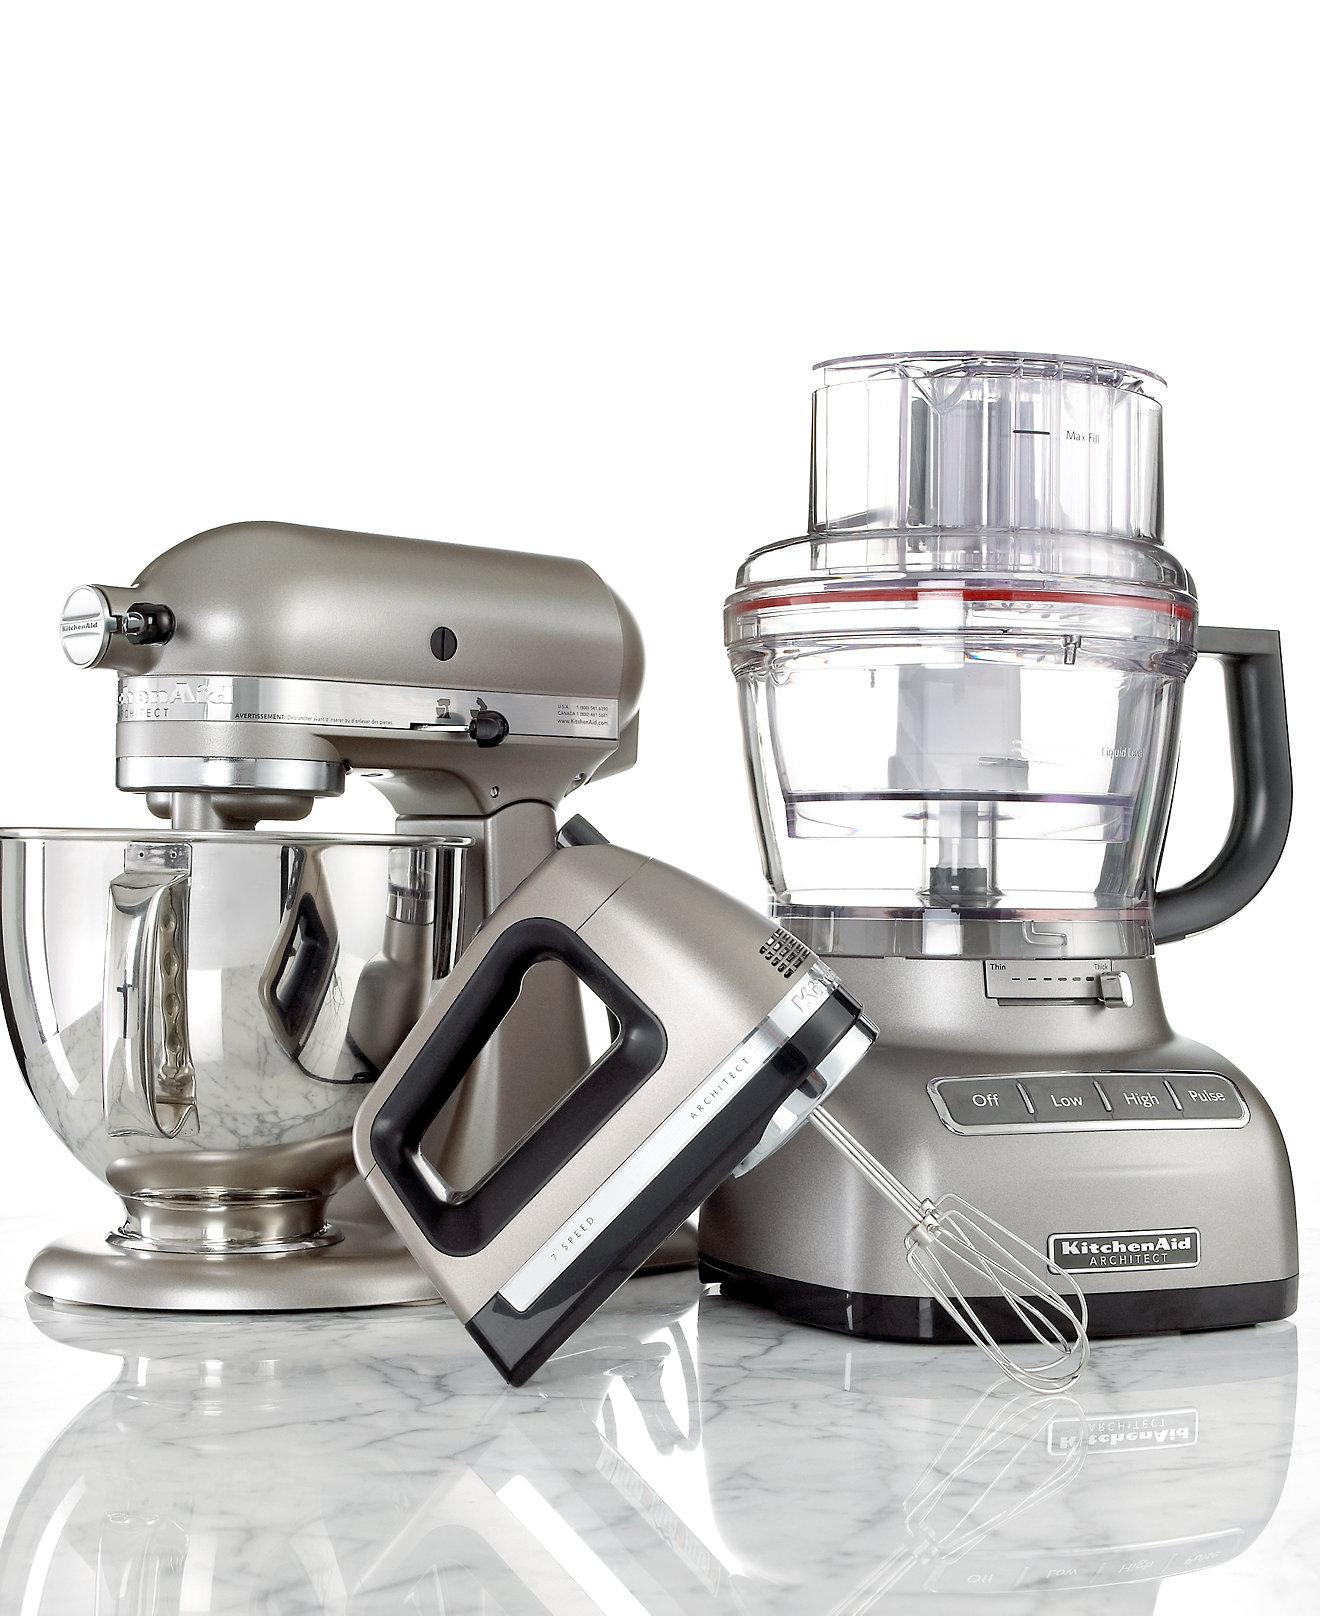 KitchenAid Appliances & Accessories - Macy's